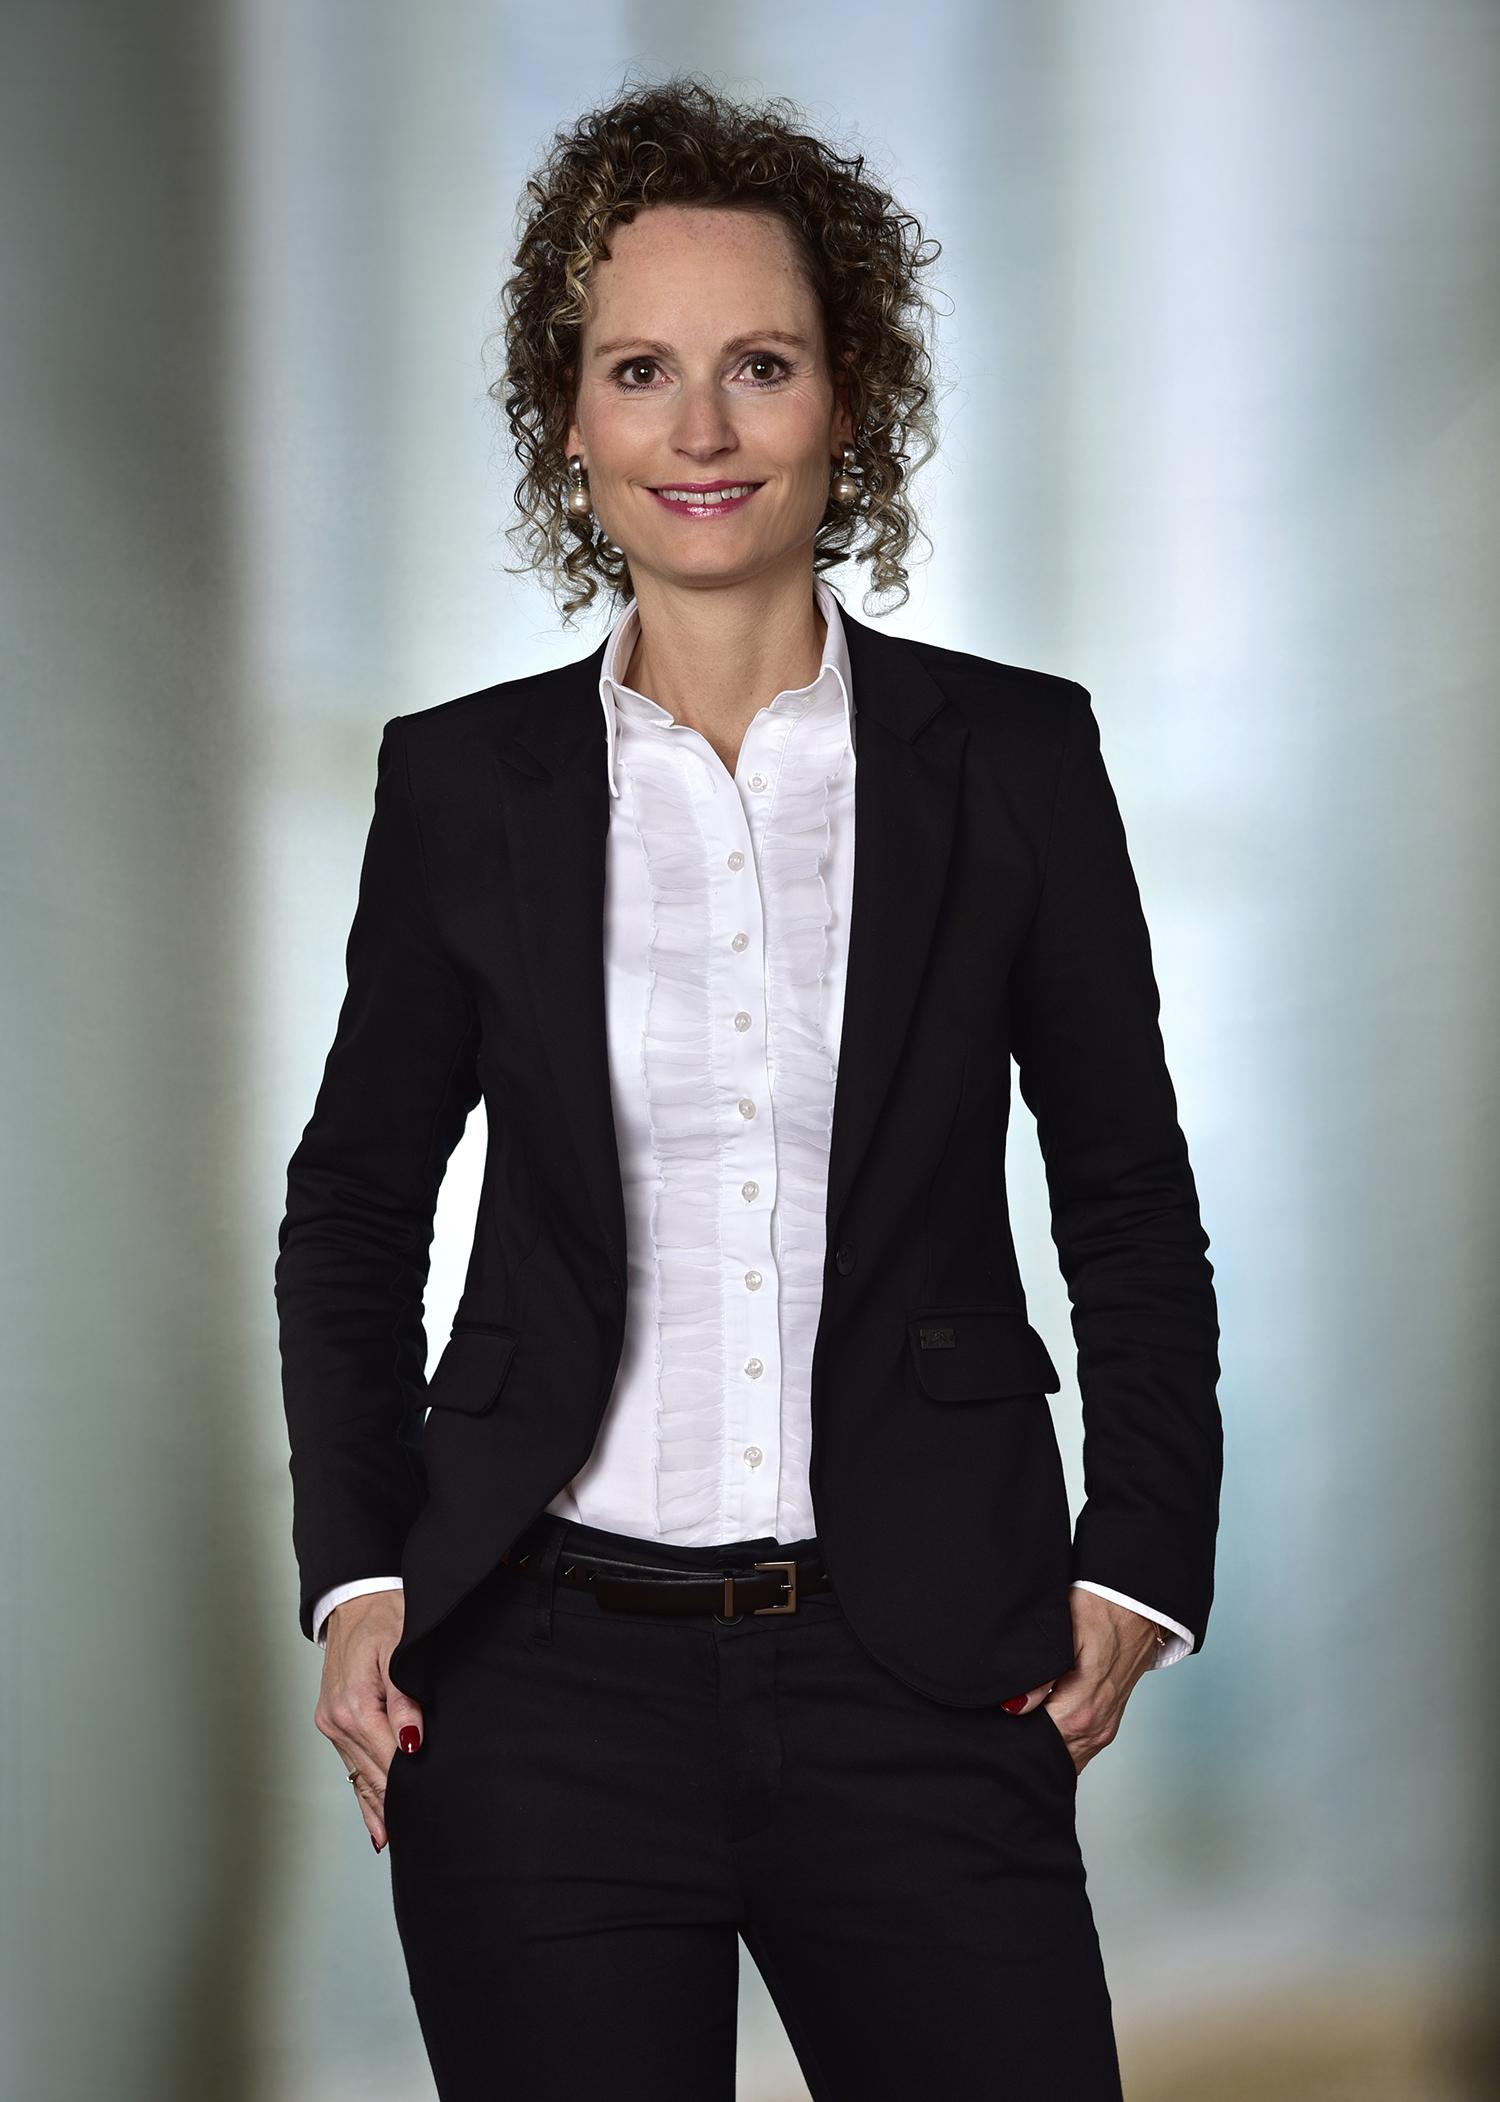 Melanie Gütschow